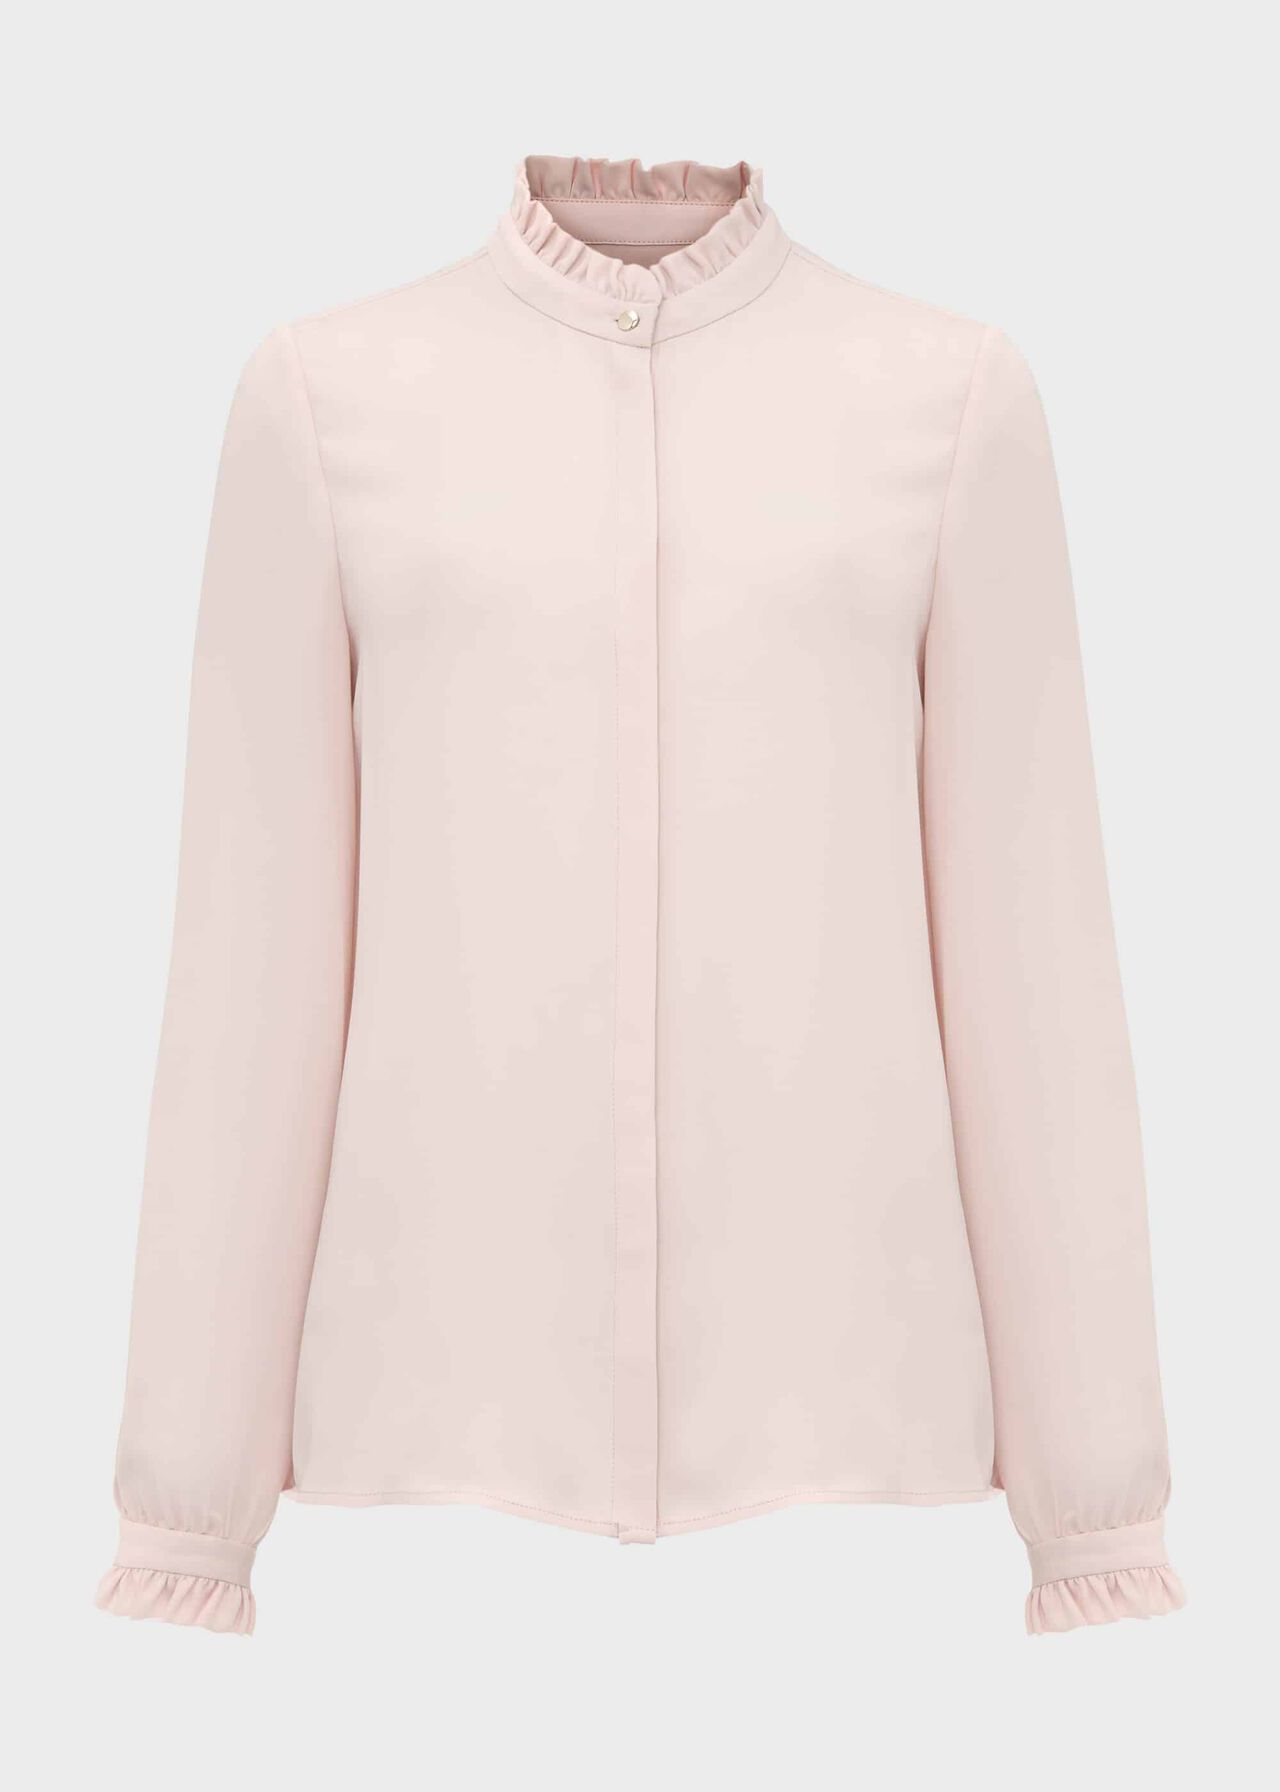 Tina Blouse Pale Pink